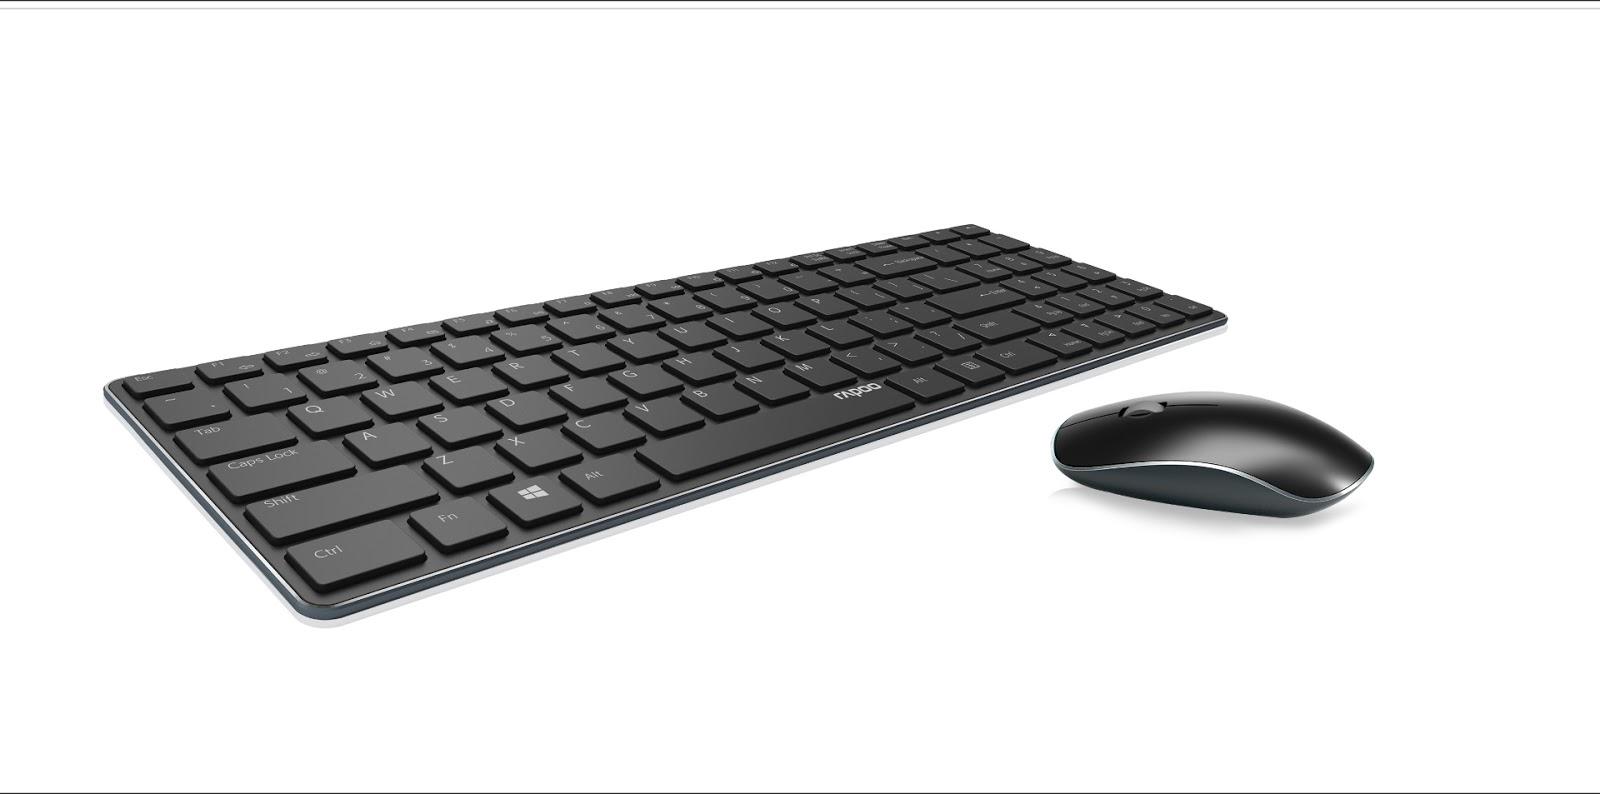 Mouse-tastiera-xbox